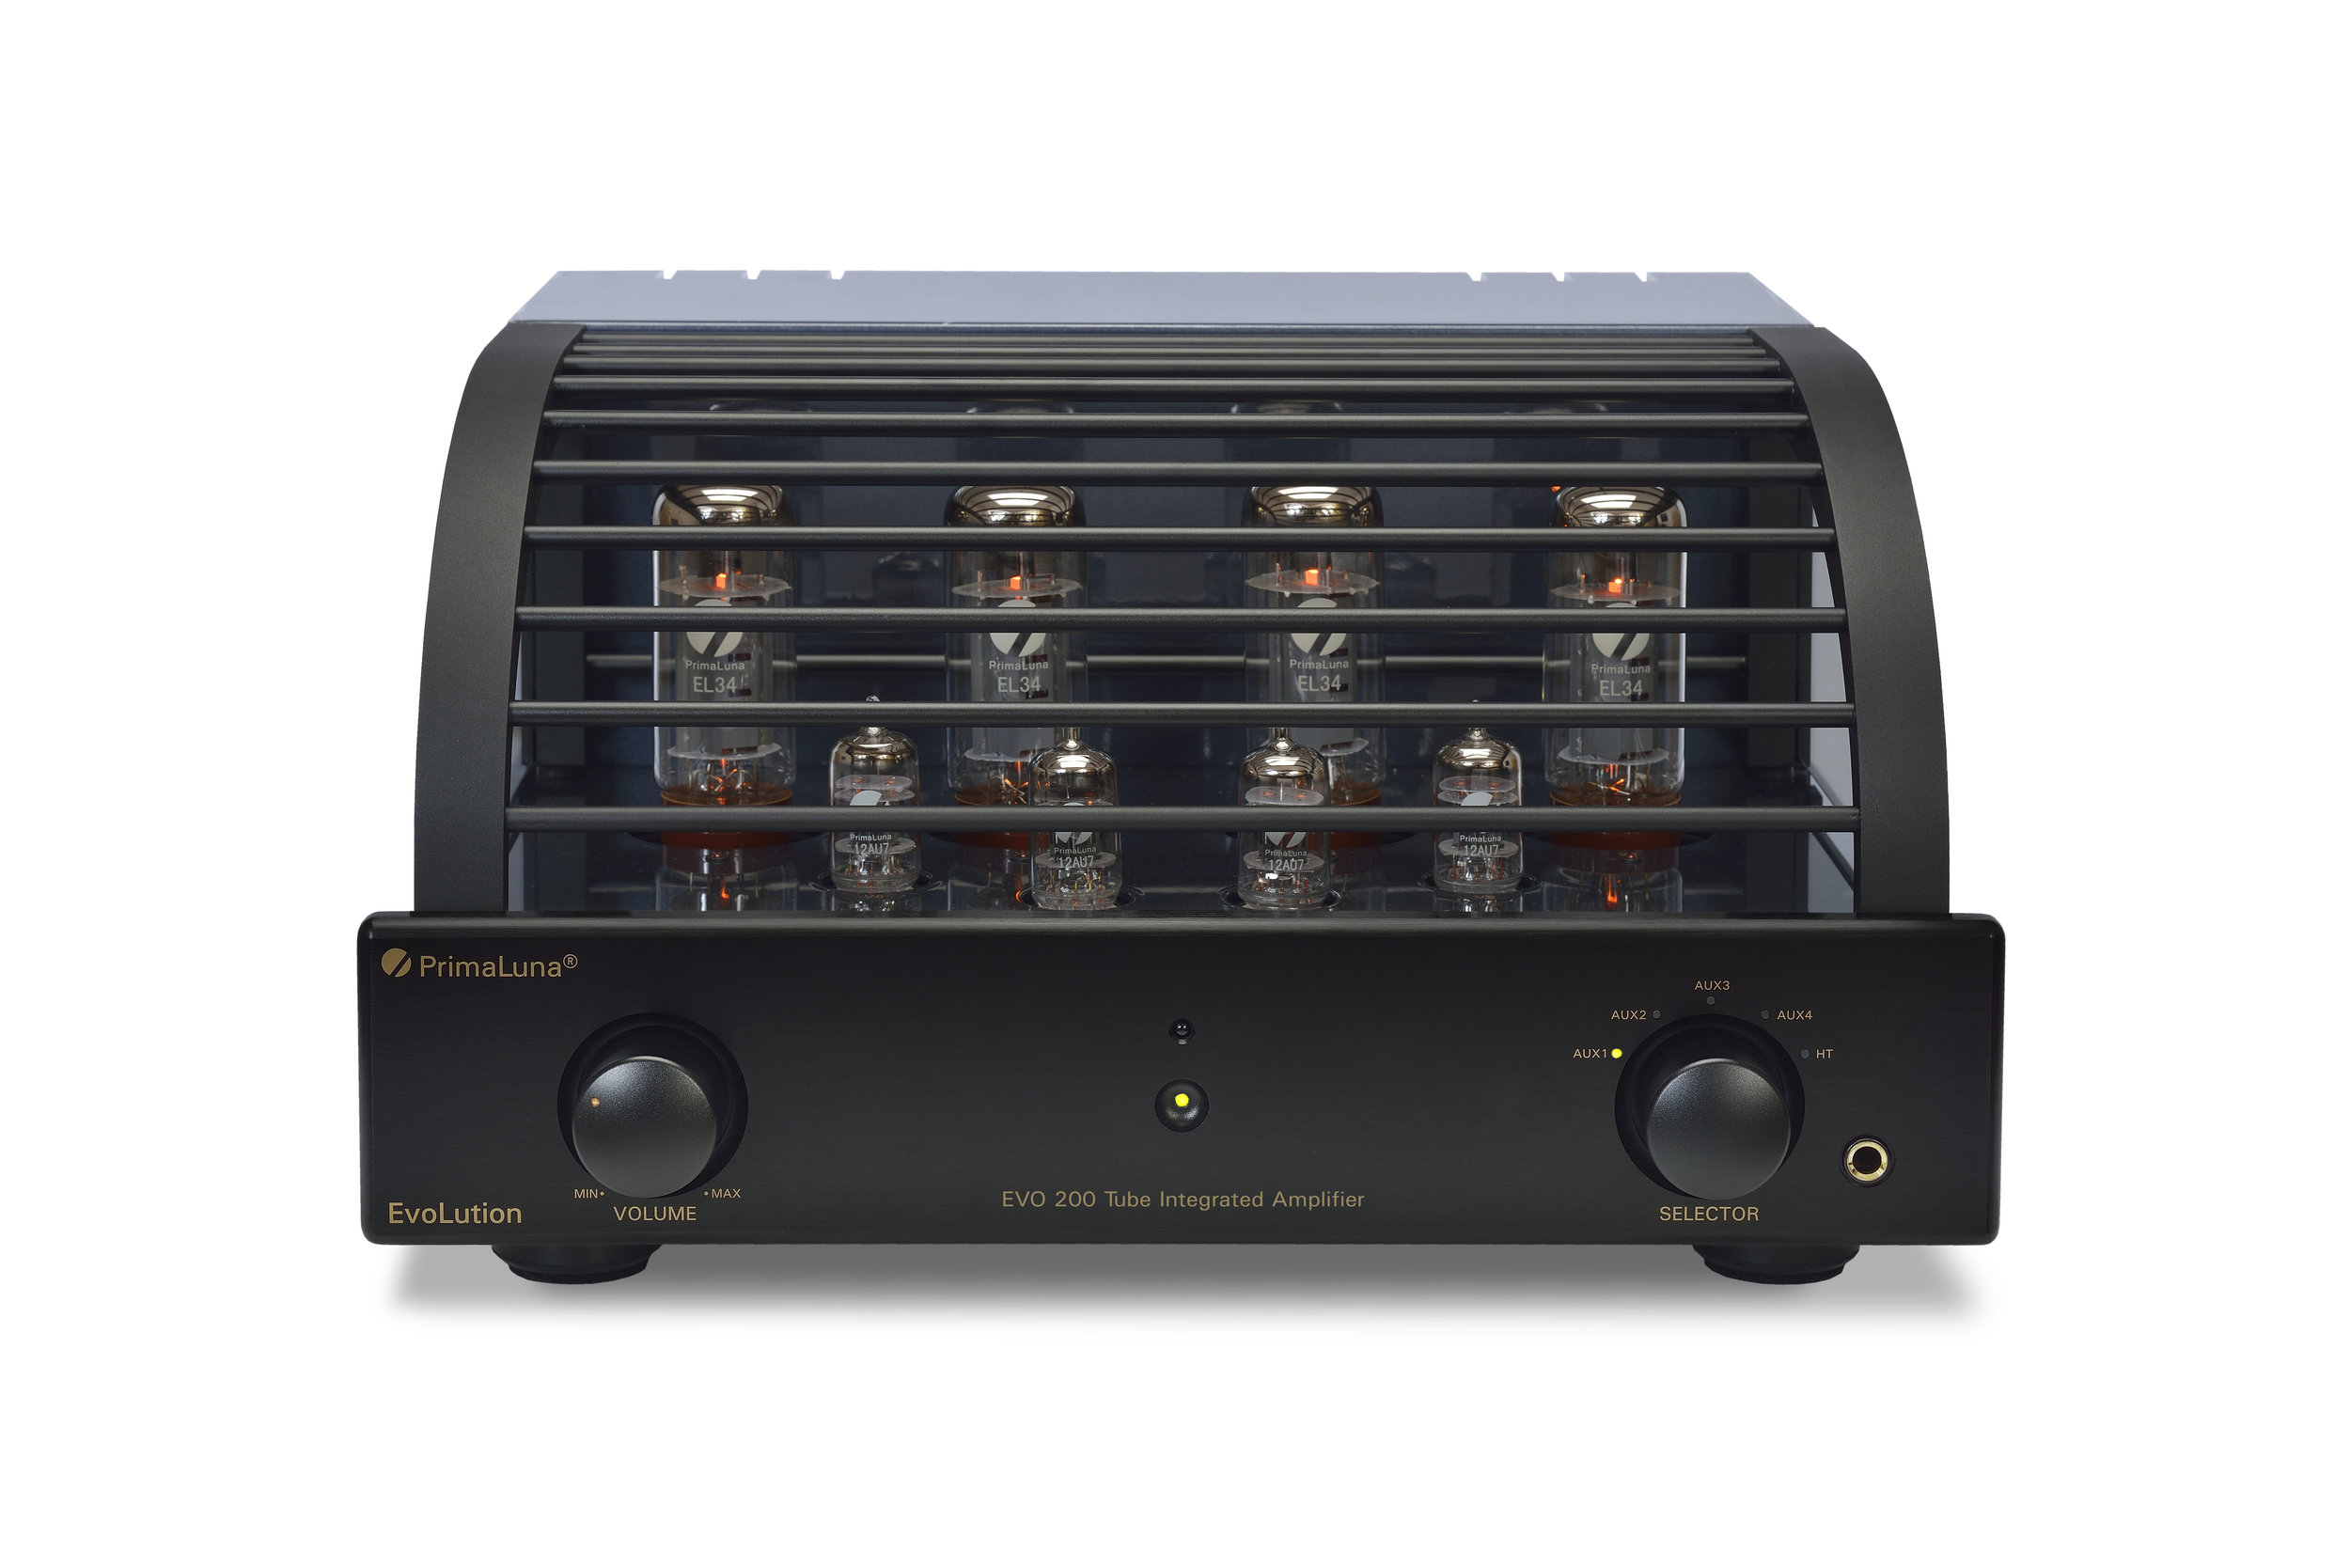 111b - PrimaLuna Evo 200 Tube Integrated Amplifier - black - front - white background.jpg